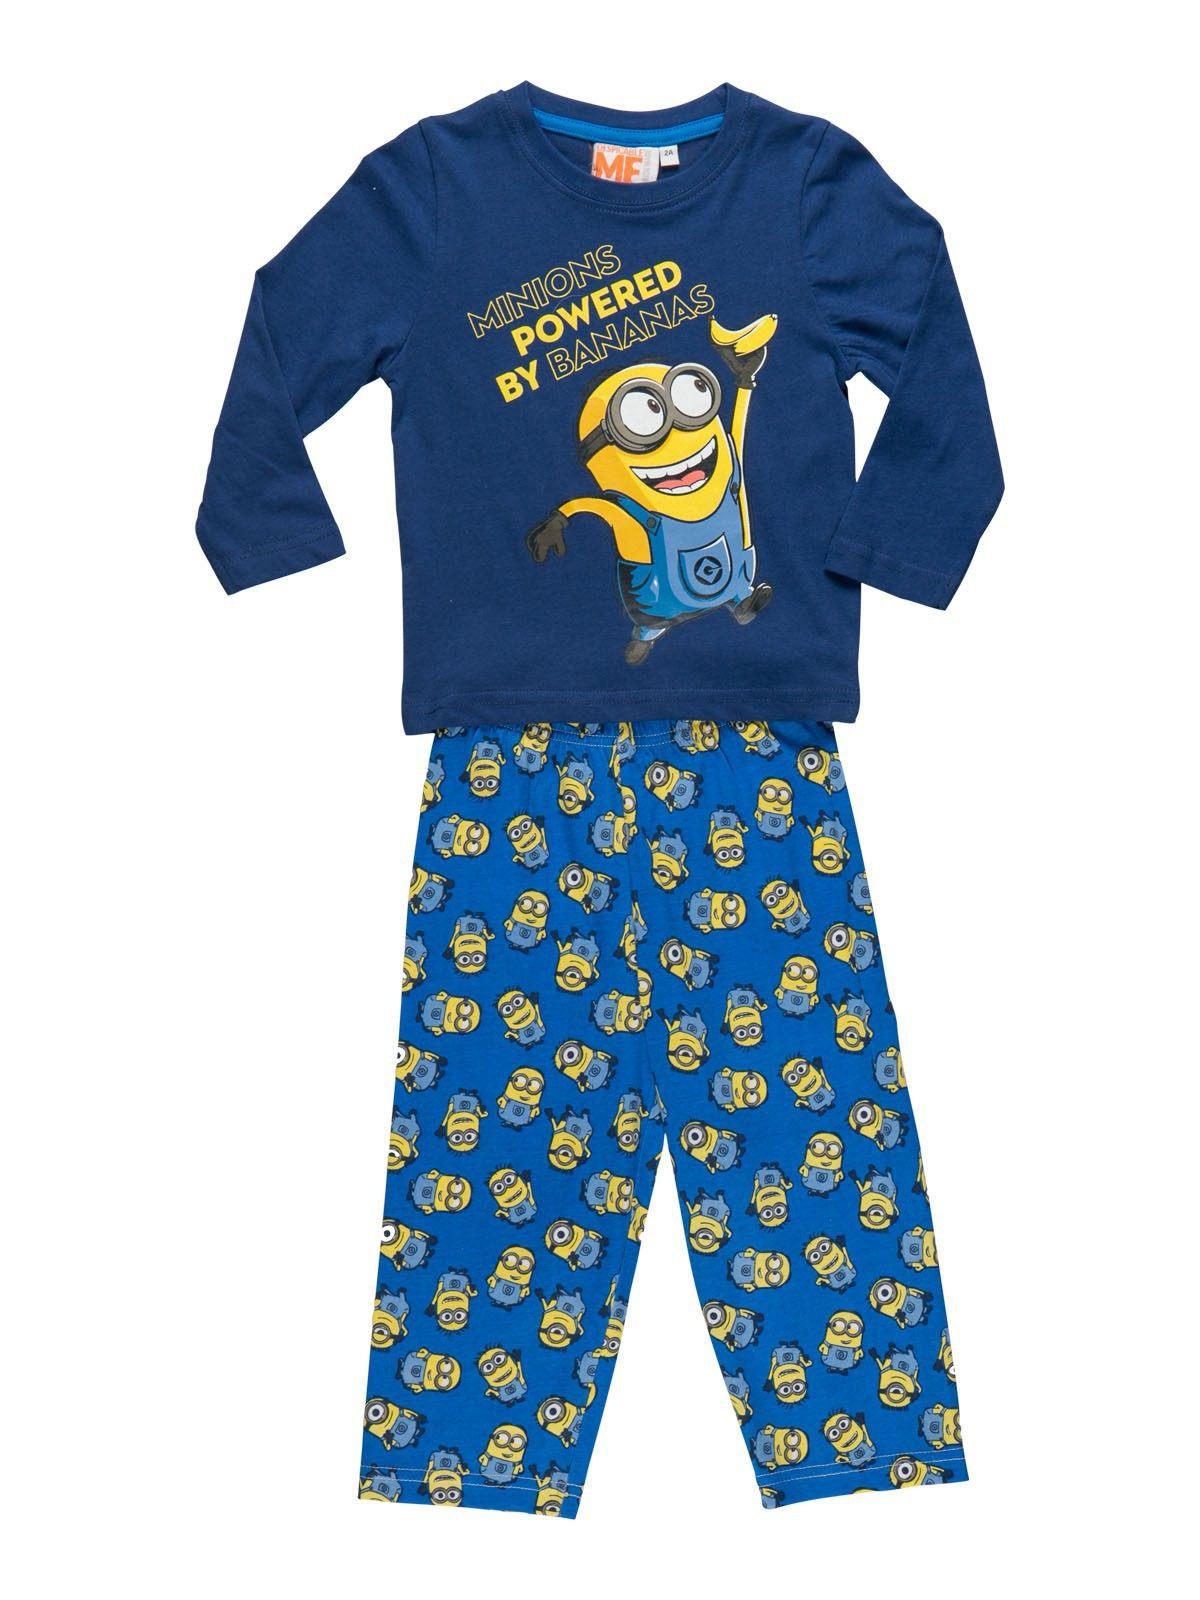 Parure De Lit Minion Belle Pyjama Minions Gar§on 2 6a Districenter